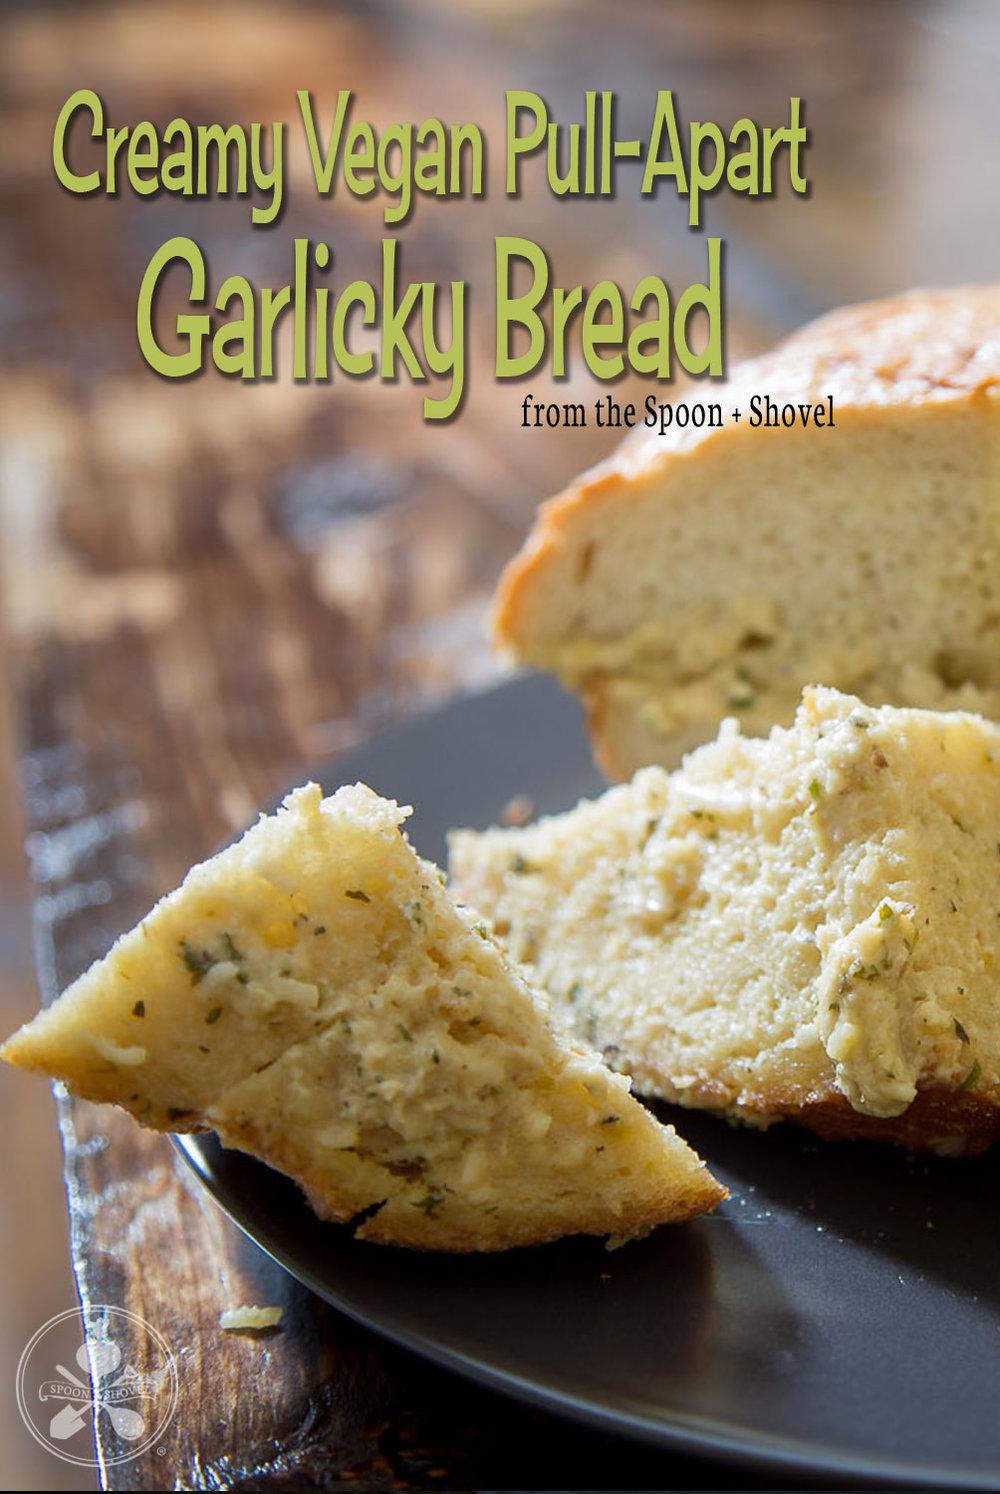 Creamy Vegan Pull-Apart Garlic Bread from The Spoon + Shovel